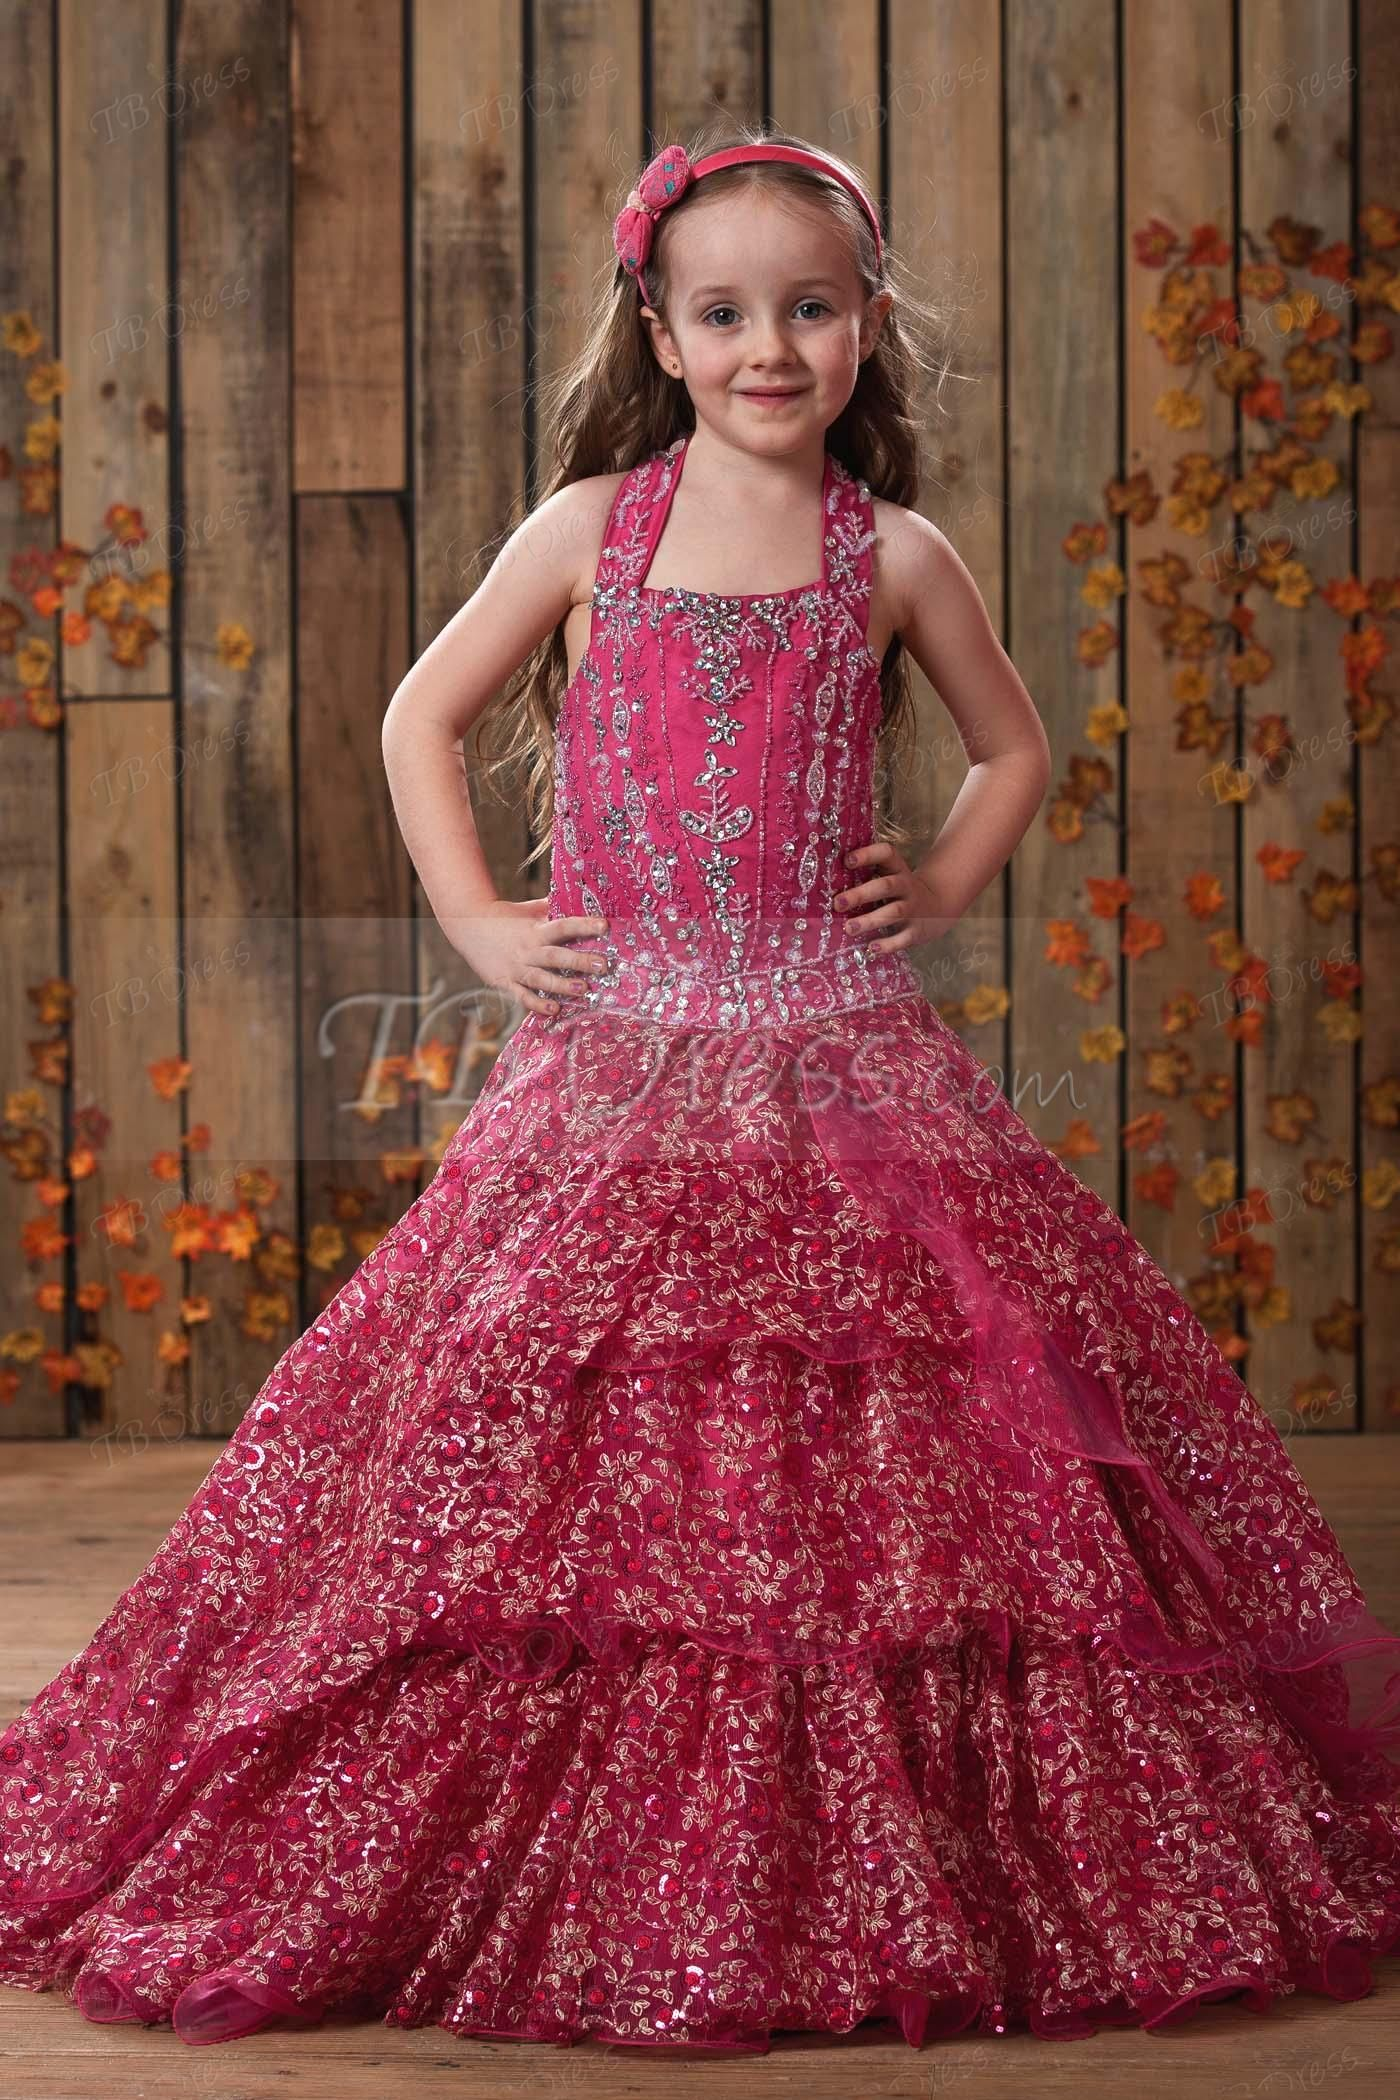 Fashion A-Line Halter Floor-length Sequins Flower Girl Dress